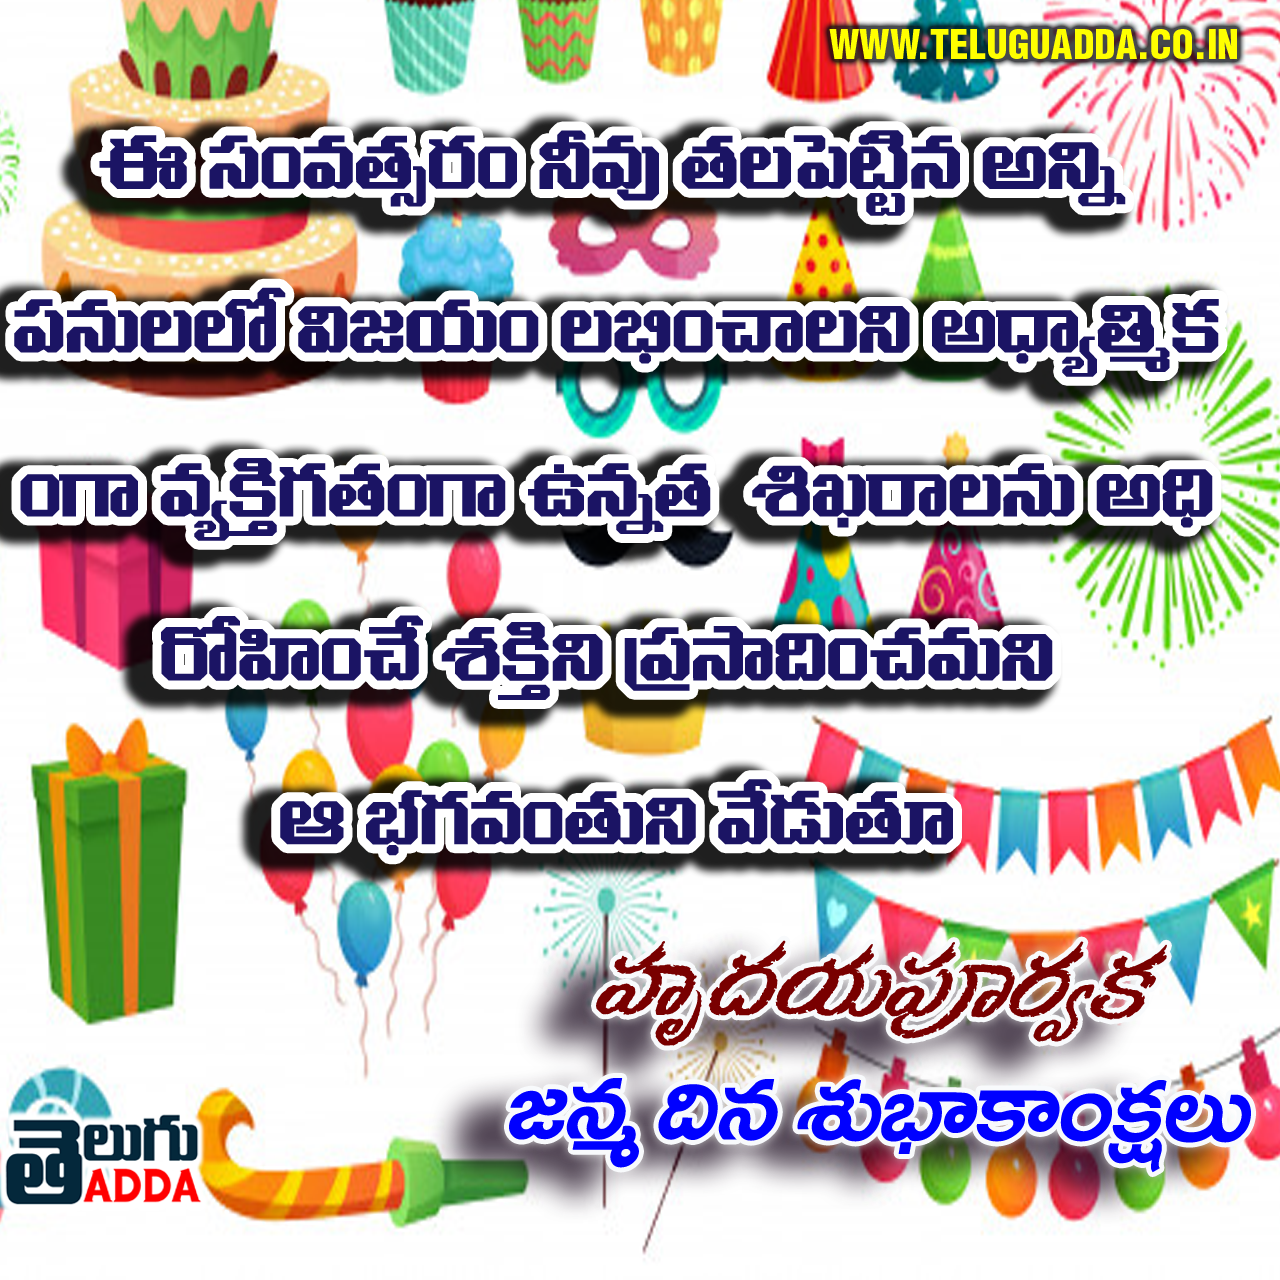 BIRTHDAY WISHES IN TELUGU - HAPPY BIRTHDAY WISHES IN TELUGU